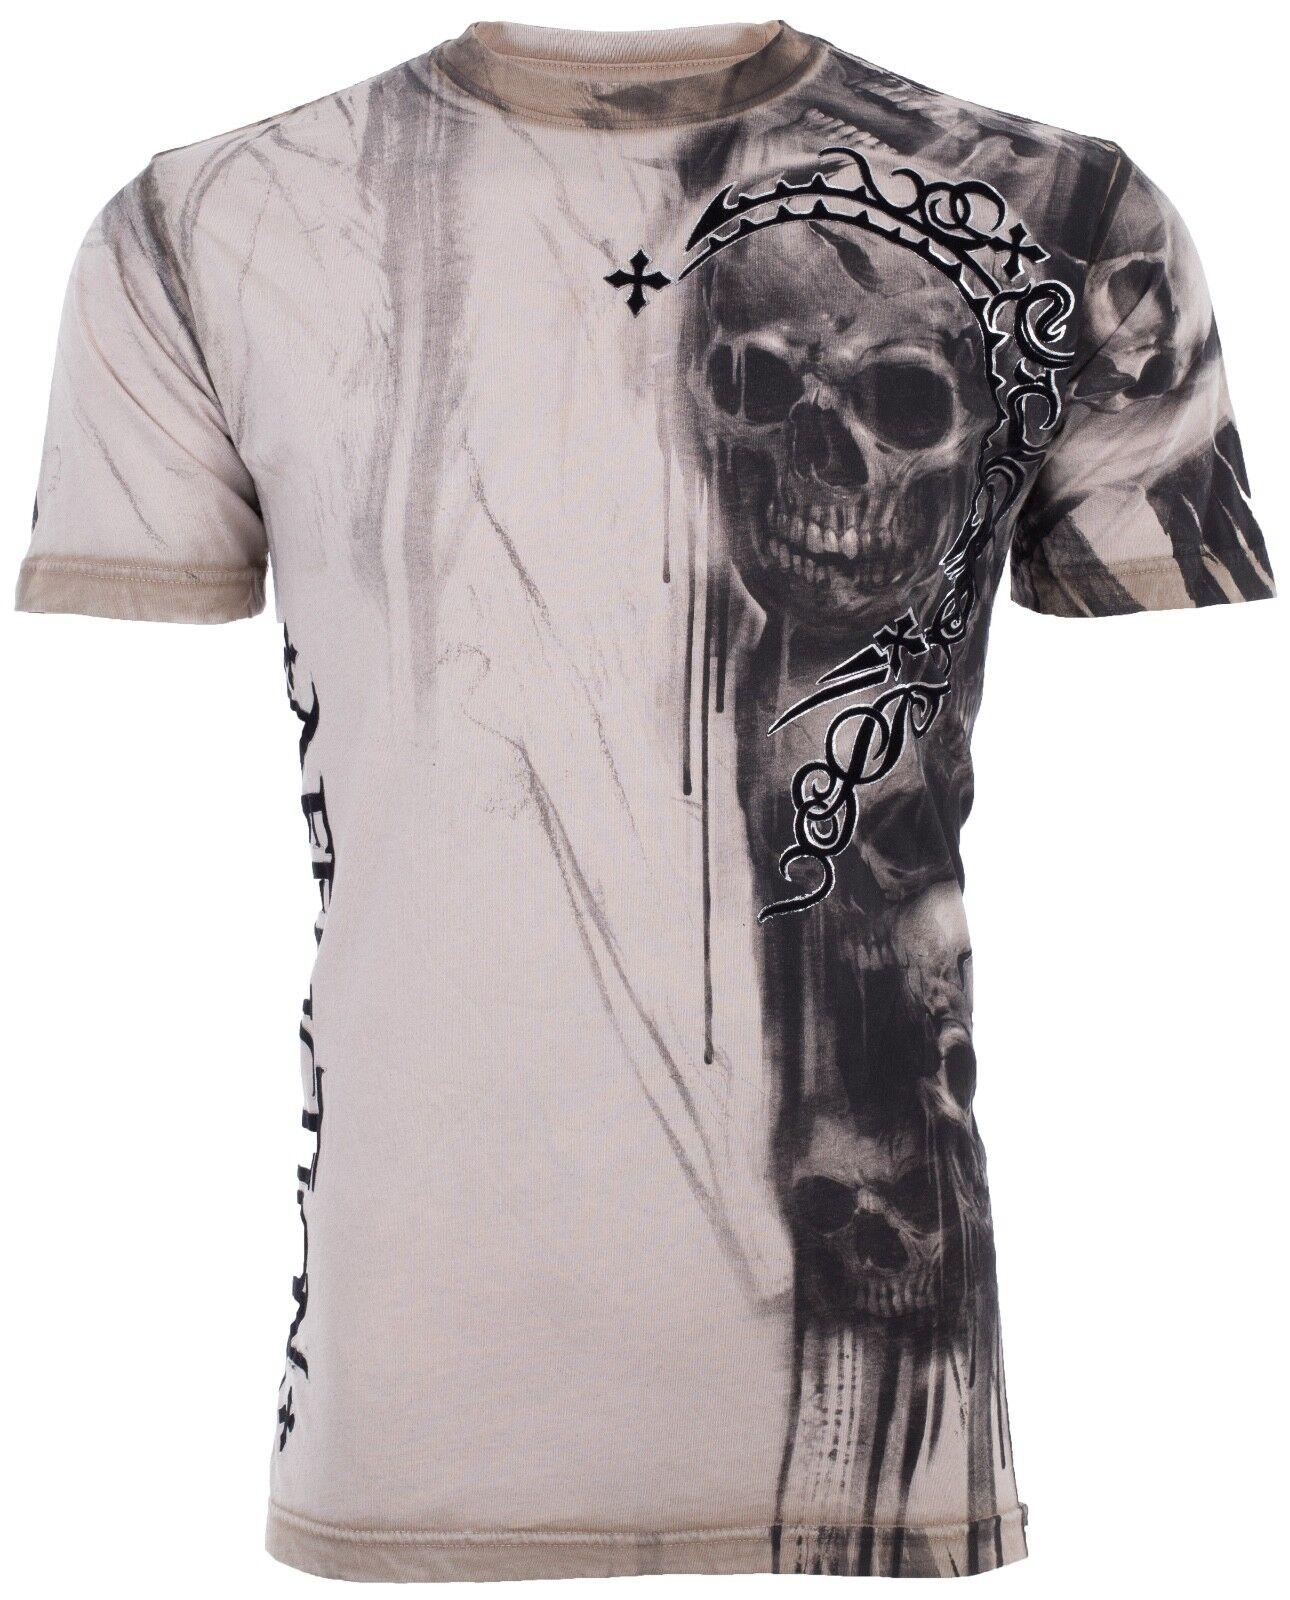 Купить AFFLICTION Men T-Shirt WALKING DEAD Skulls Tattoo Motorcycle Biker UFC Jeans $58